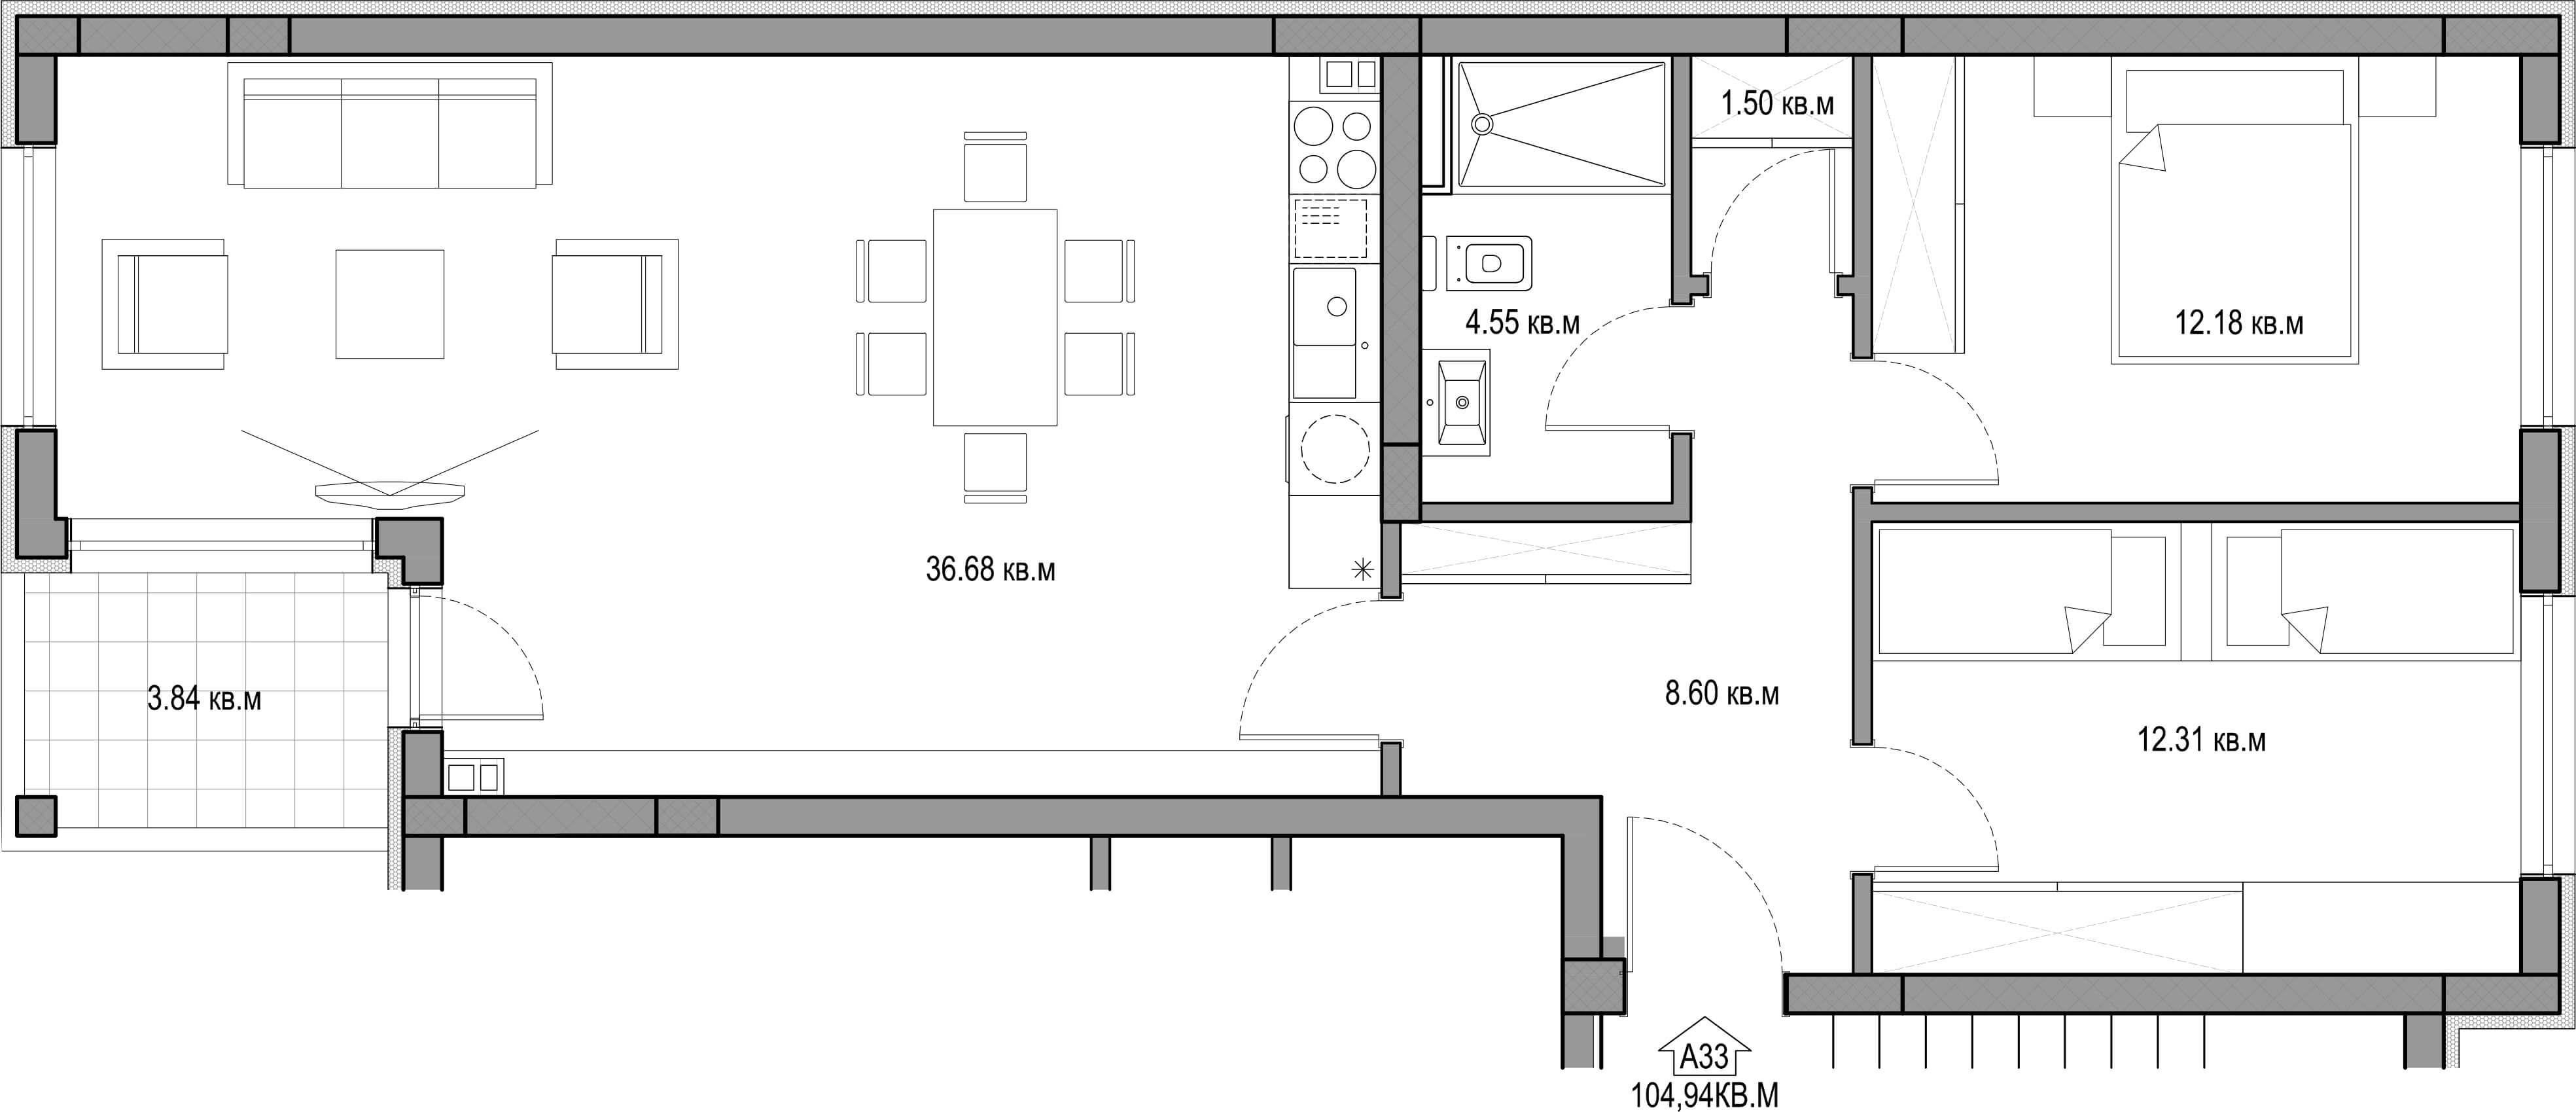 Vinitsa_Apartment_2_33